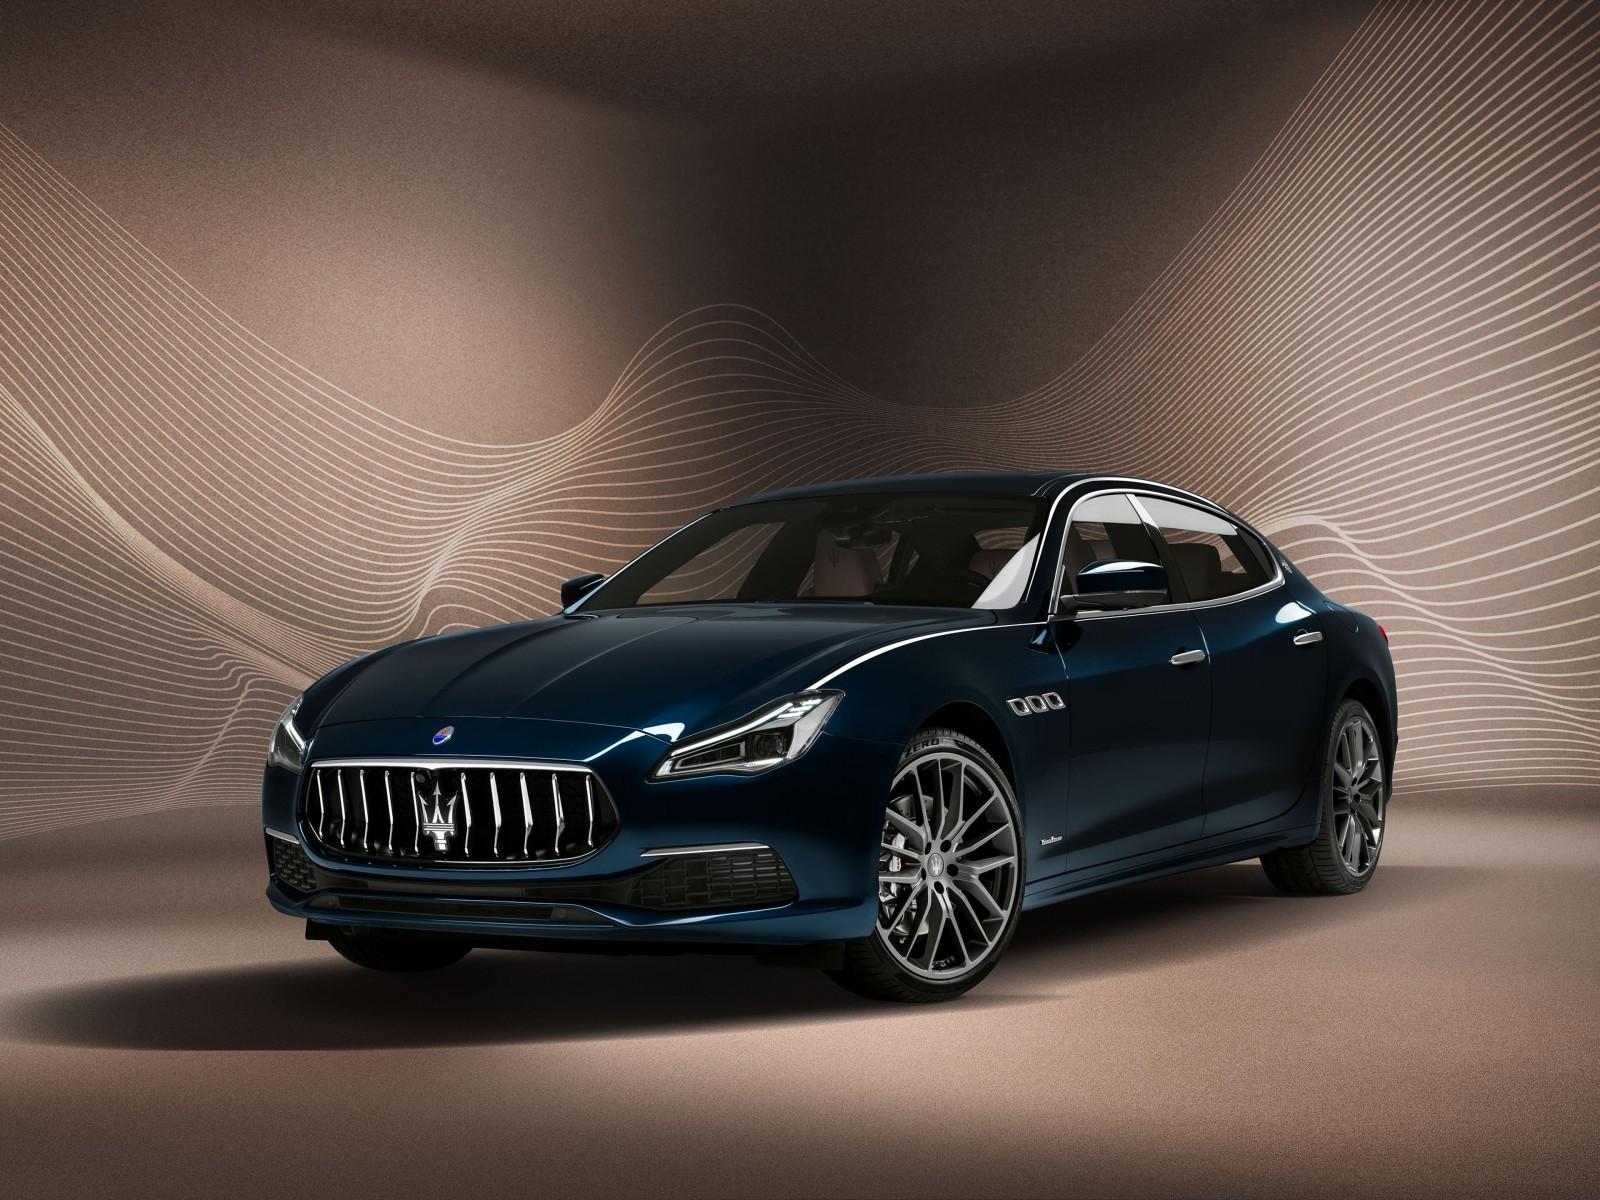 Maserati Quattroporte GranLusso Royale 2020 5K HD desktop 1600x1200